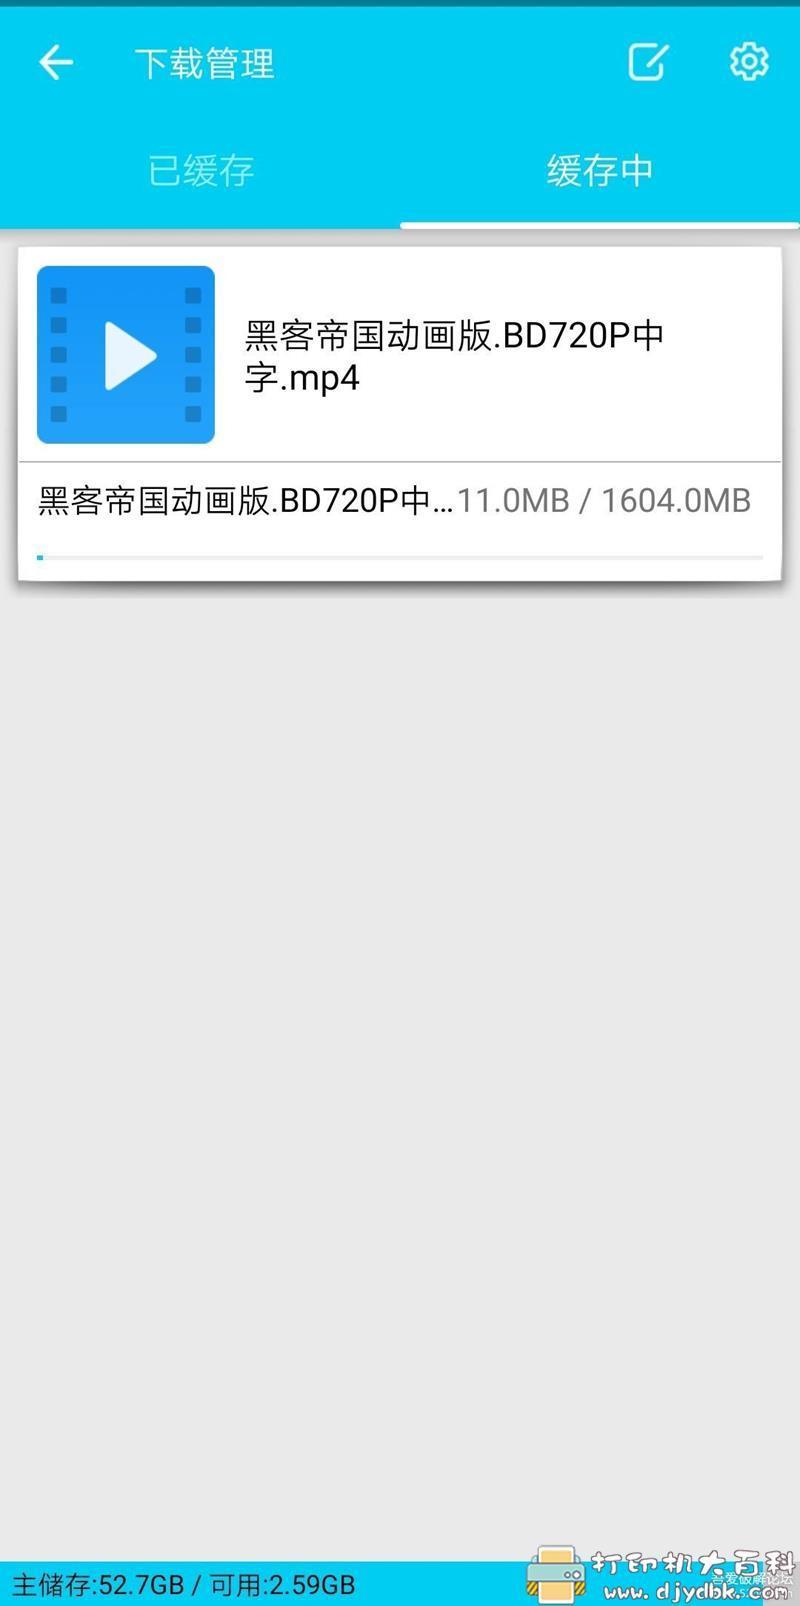 [Android]酷享磁力云 最新修改版图片 No.2